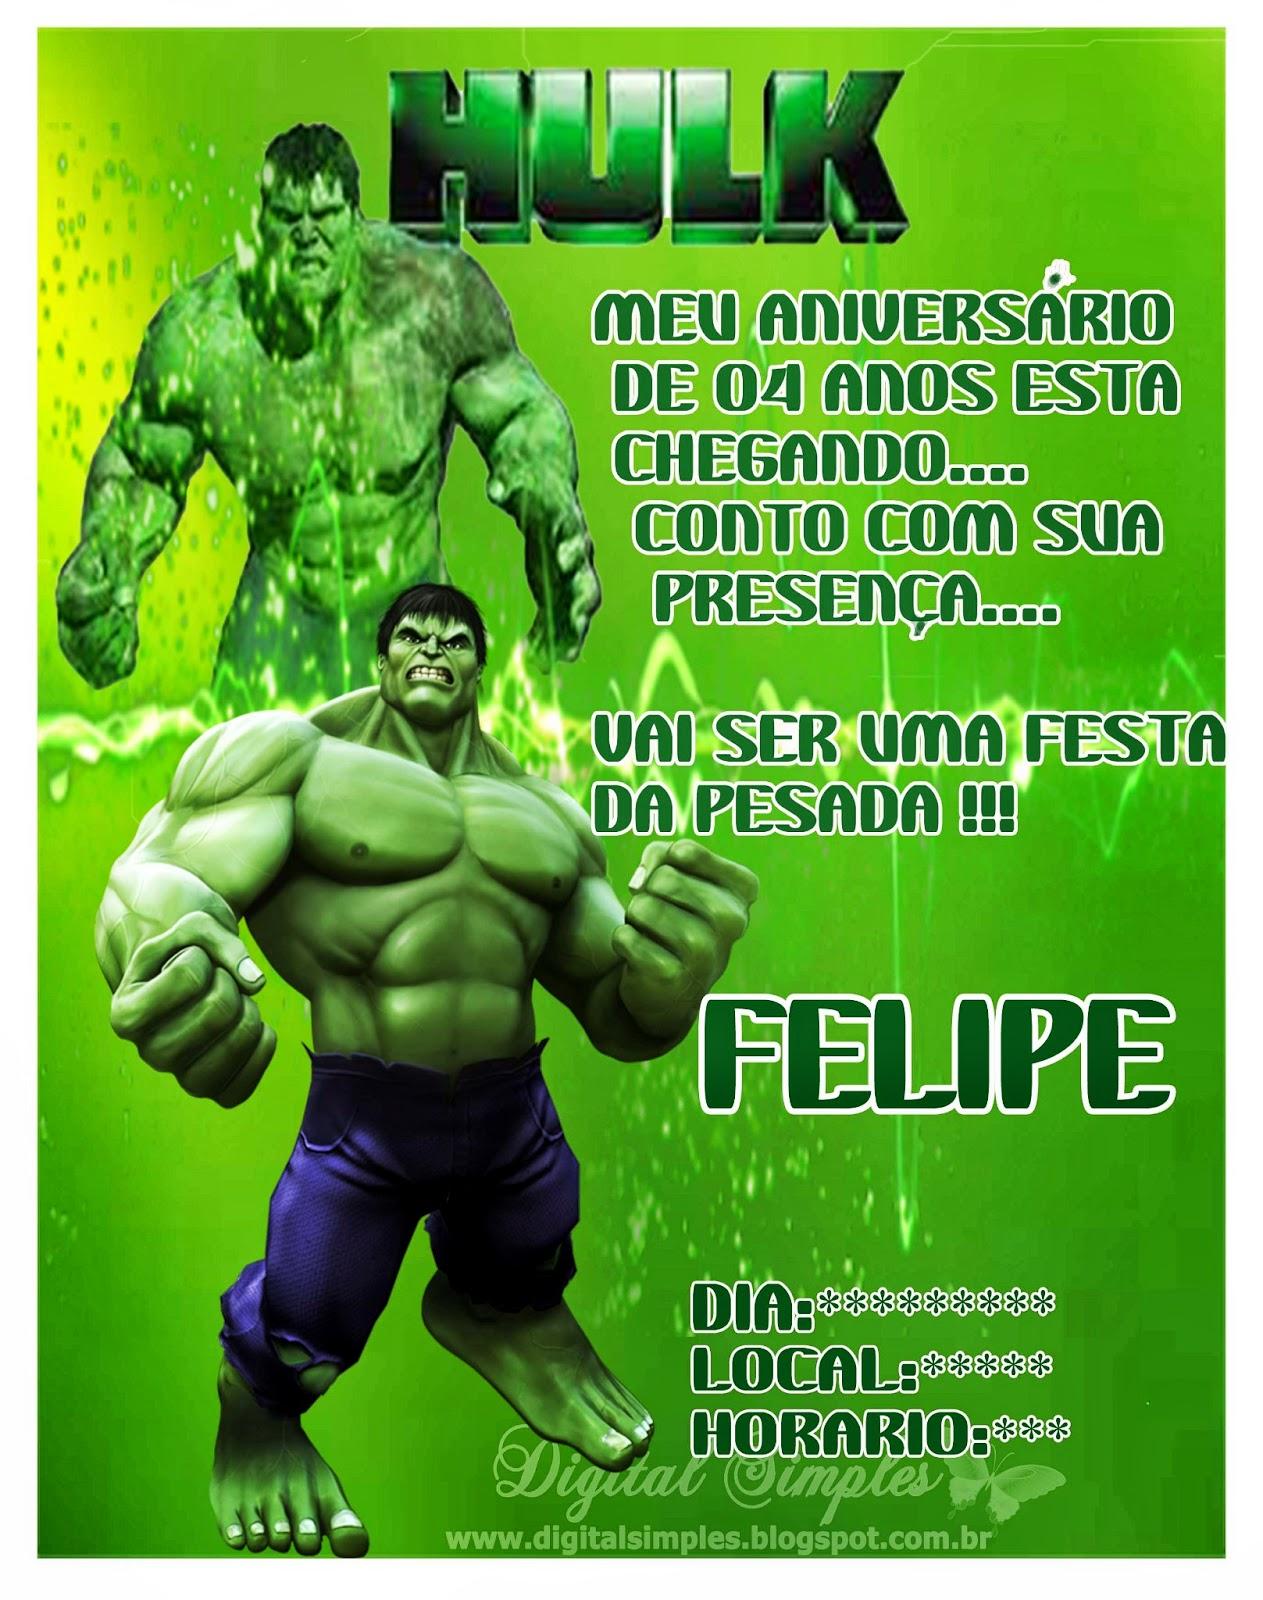 Incrivel Hulck Best convite infantil o incrivel hulk - convites digitais simples